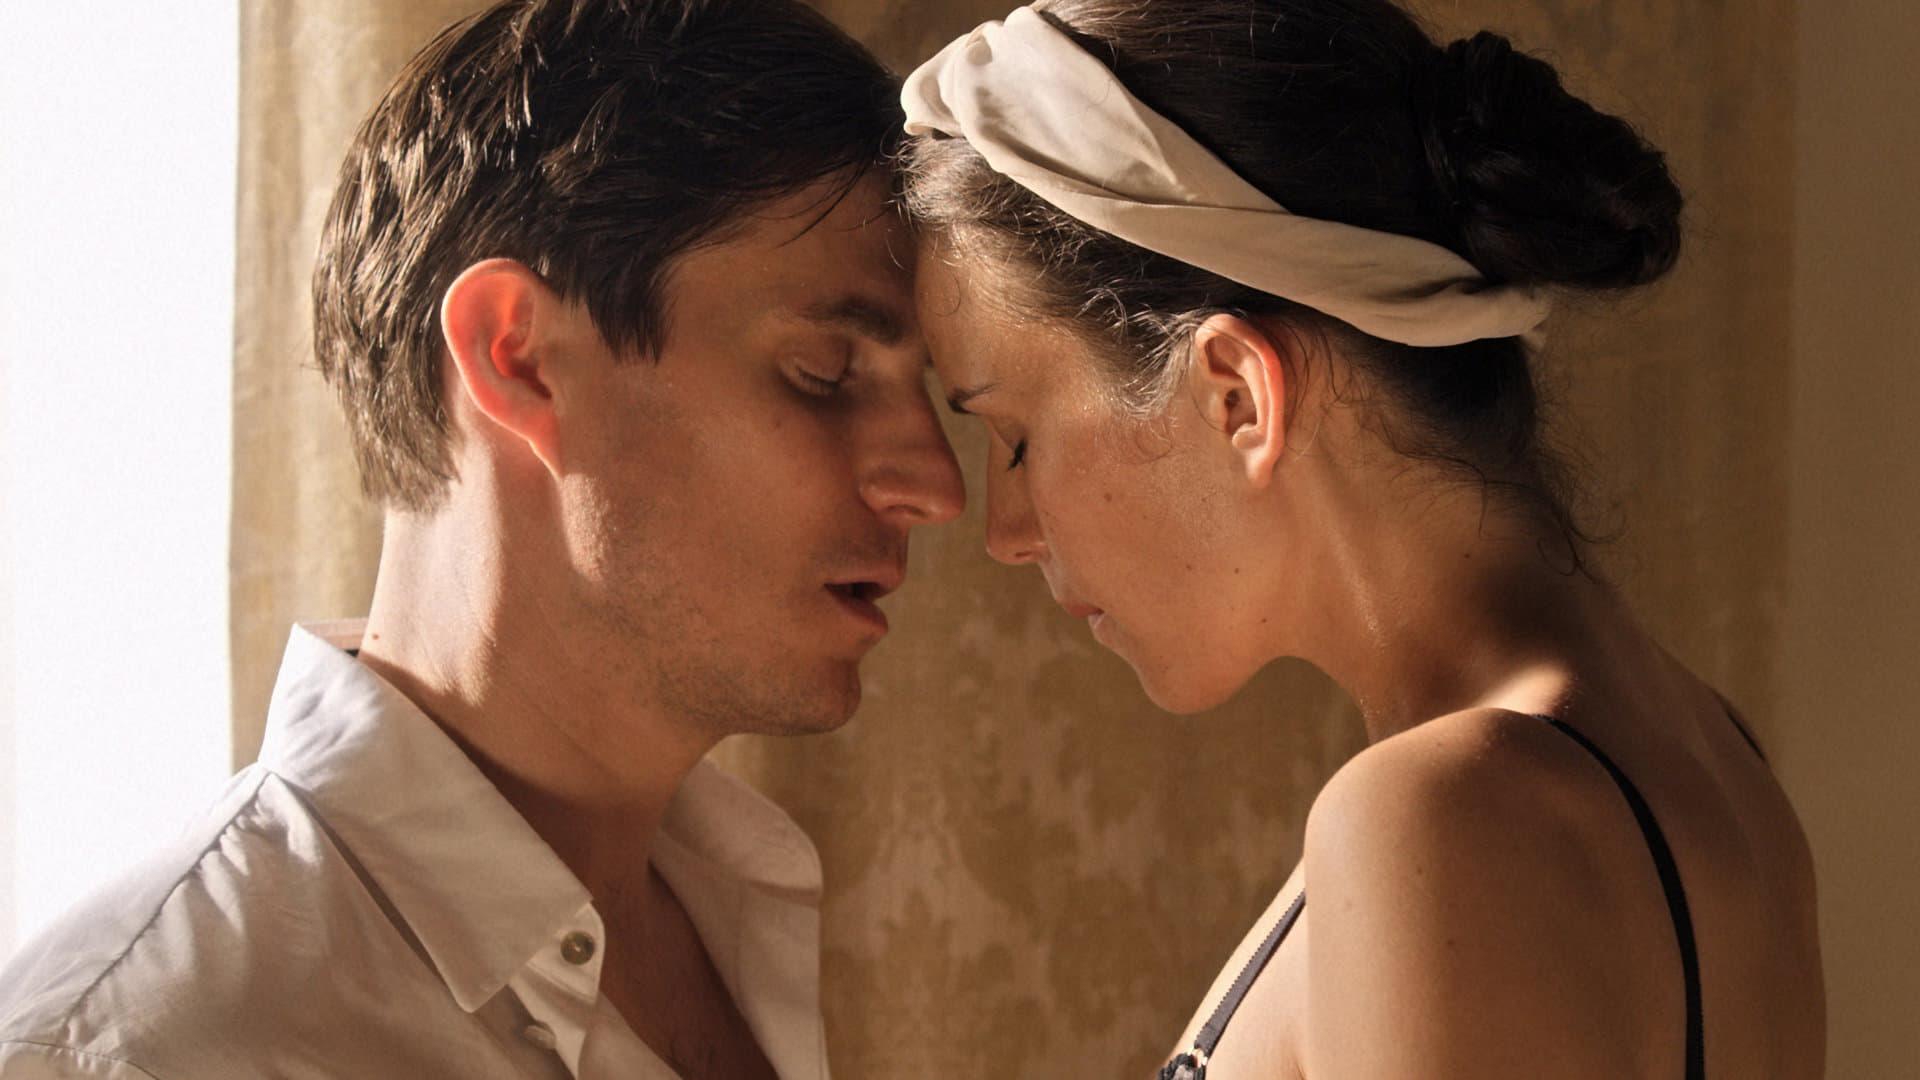 Hotel Desire (2011) - Movies - Filmanic